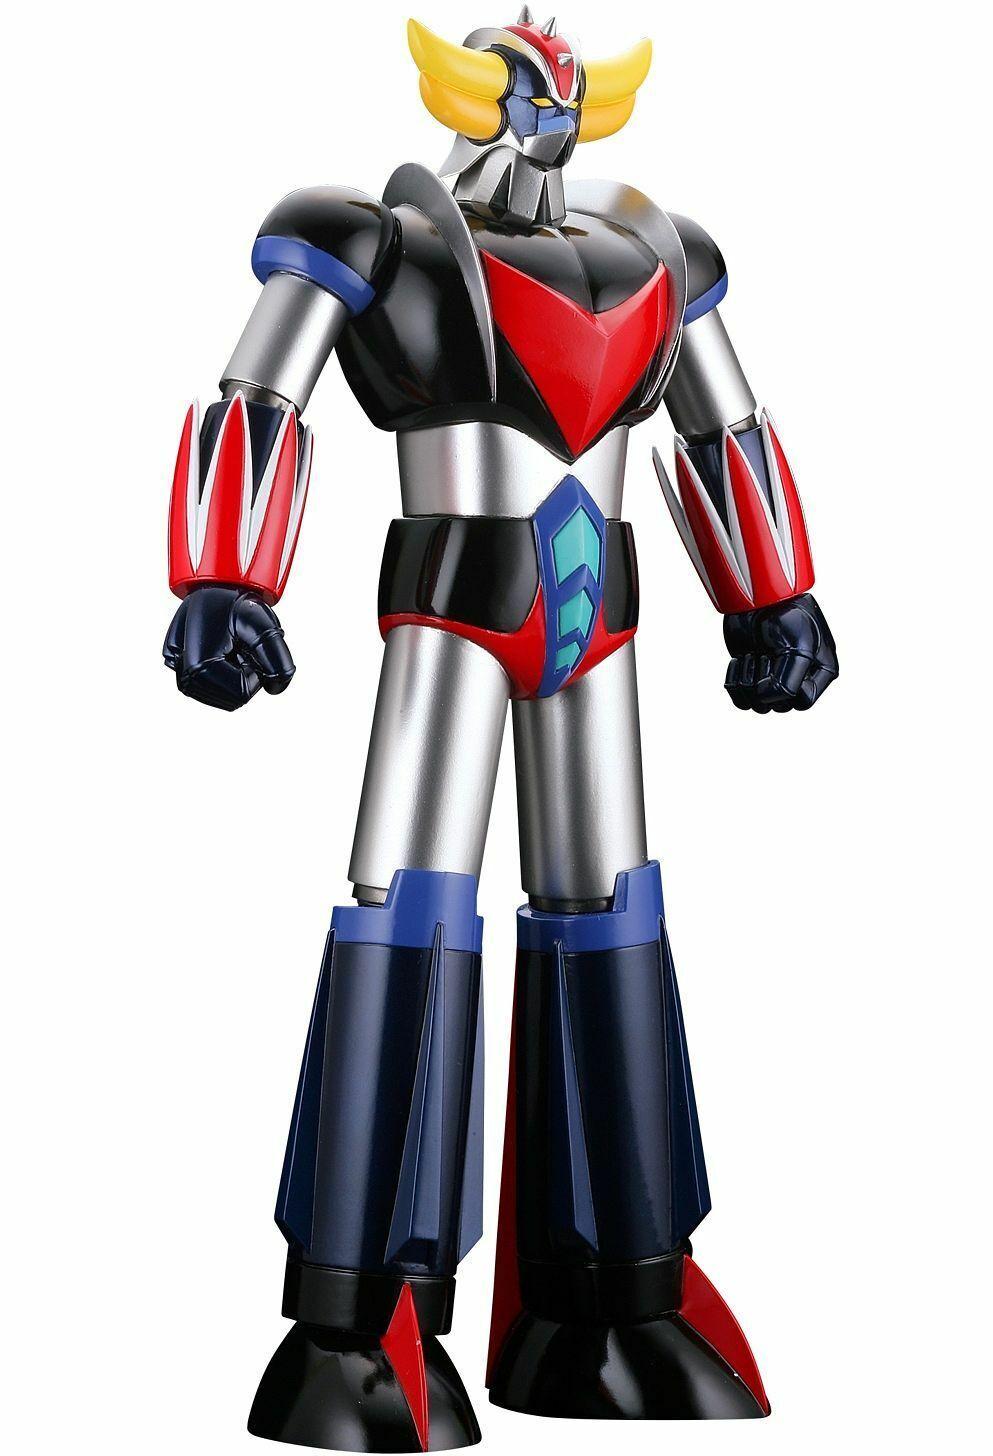 ororake oroorak Ovni Robot Grendizer Sofubi Juguete Caja HI-LINE006 Figura